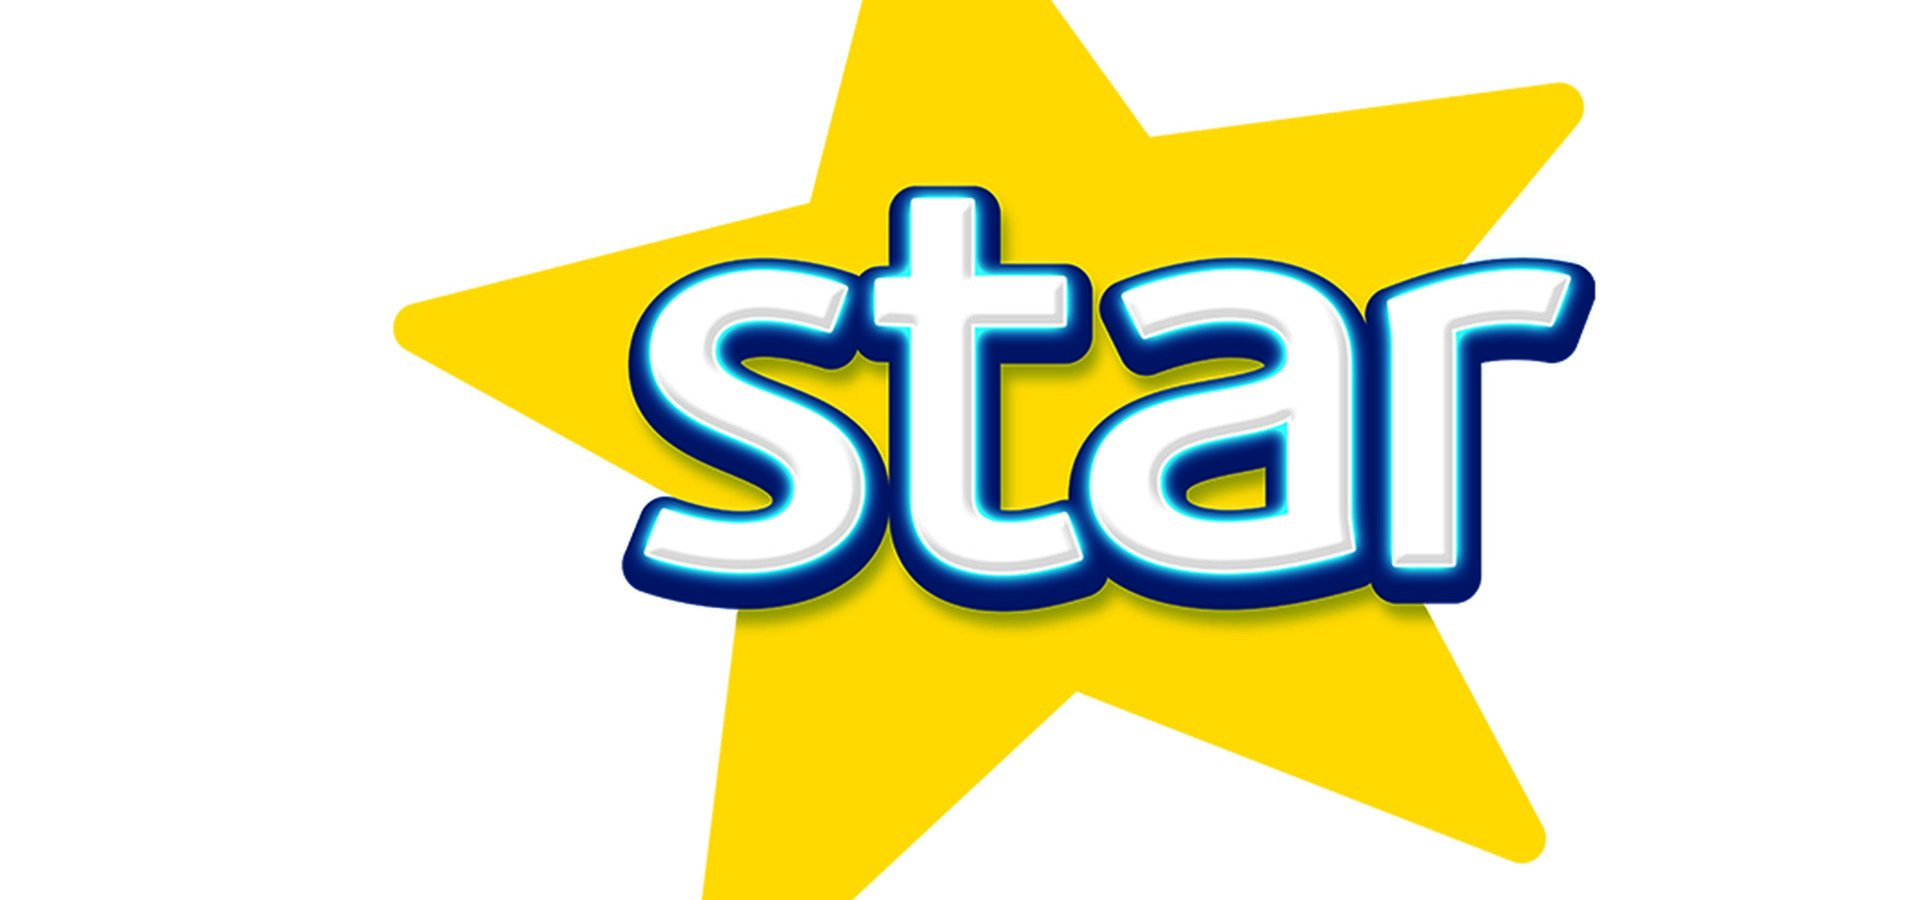 Agencja Deloitte Digital dla marki Star Chips